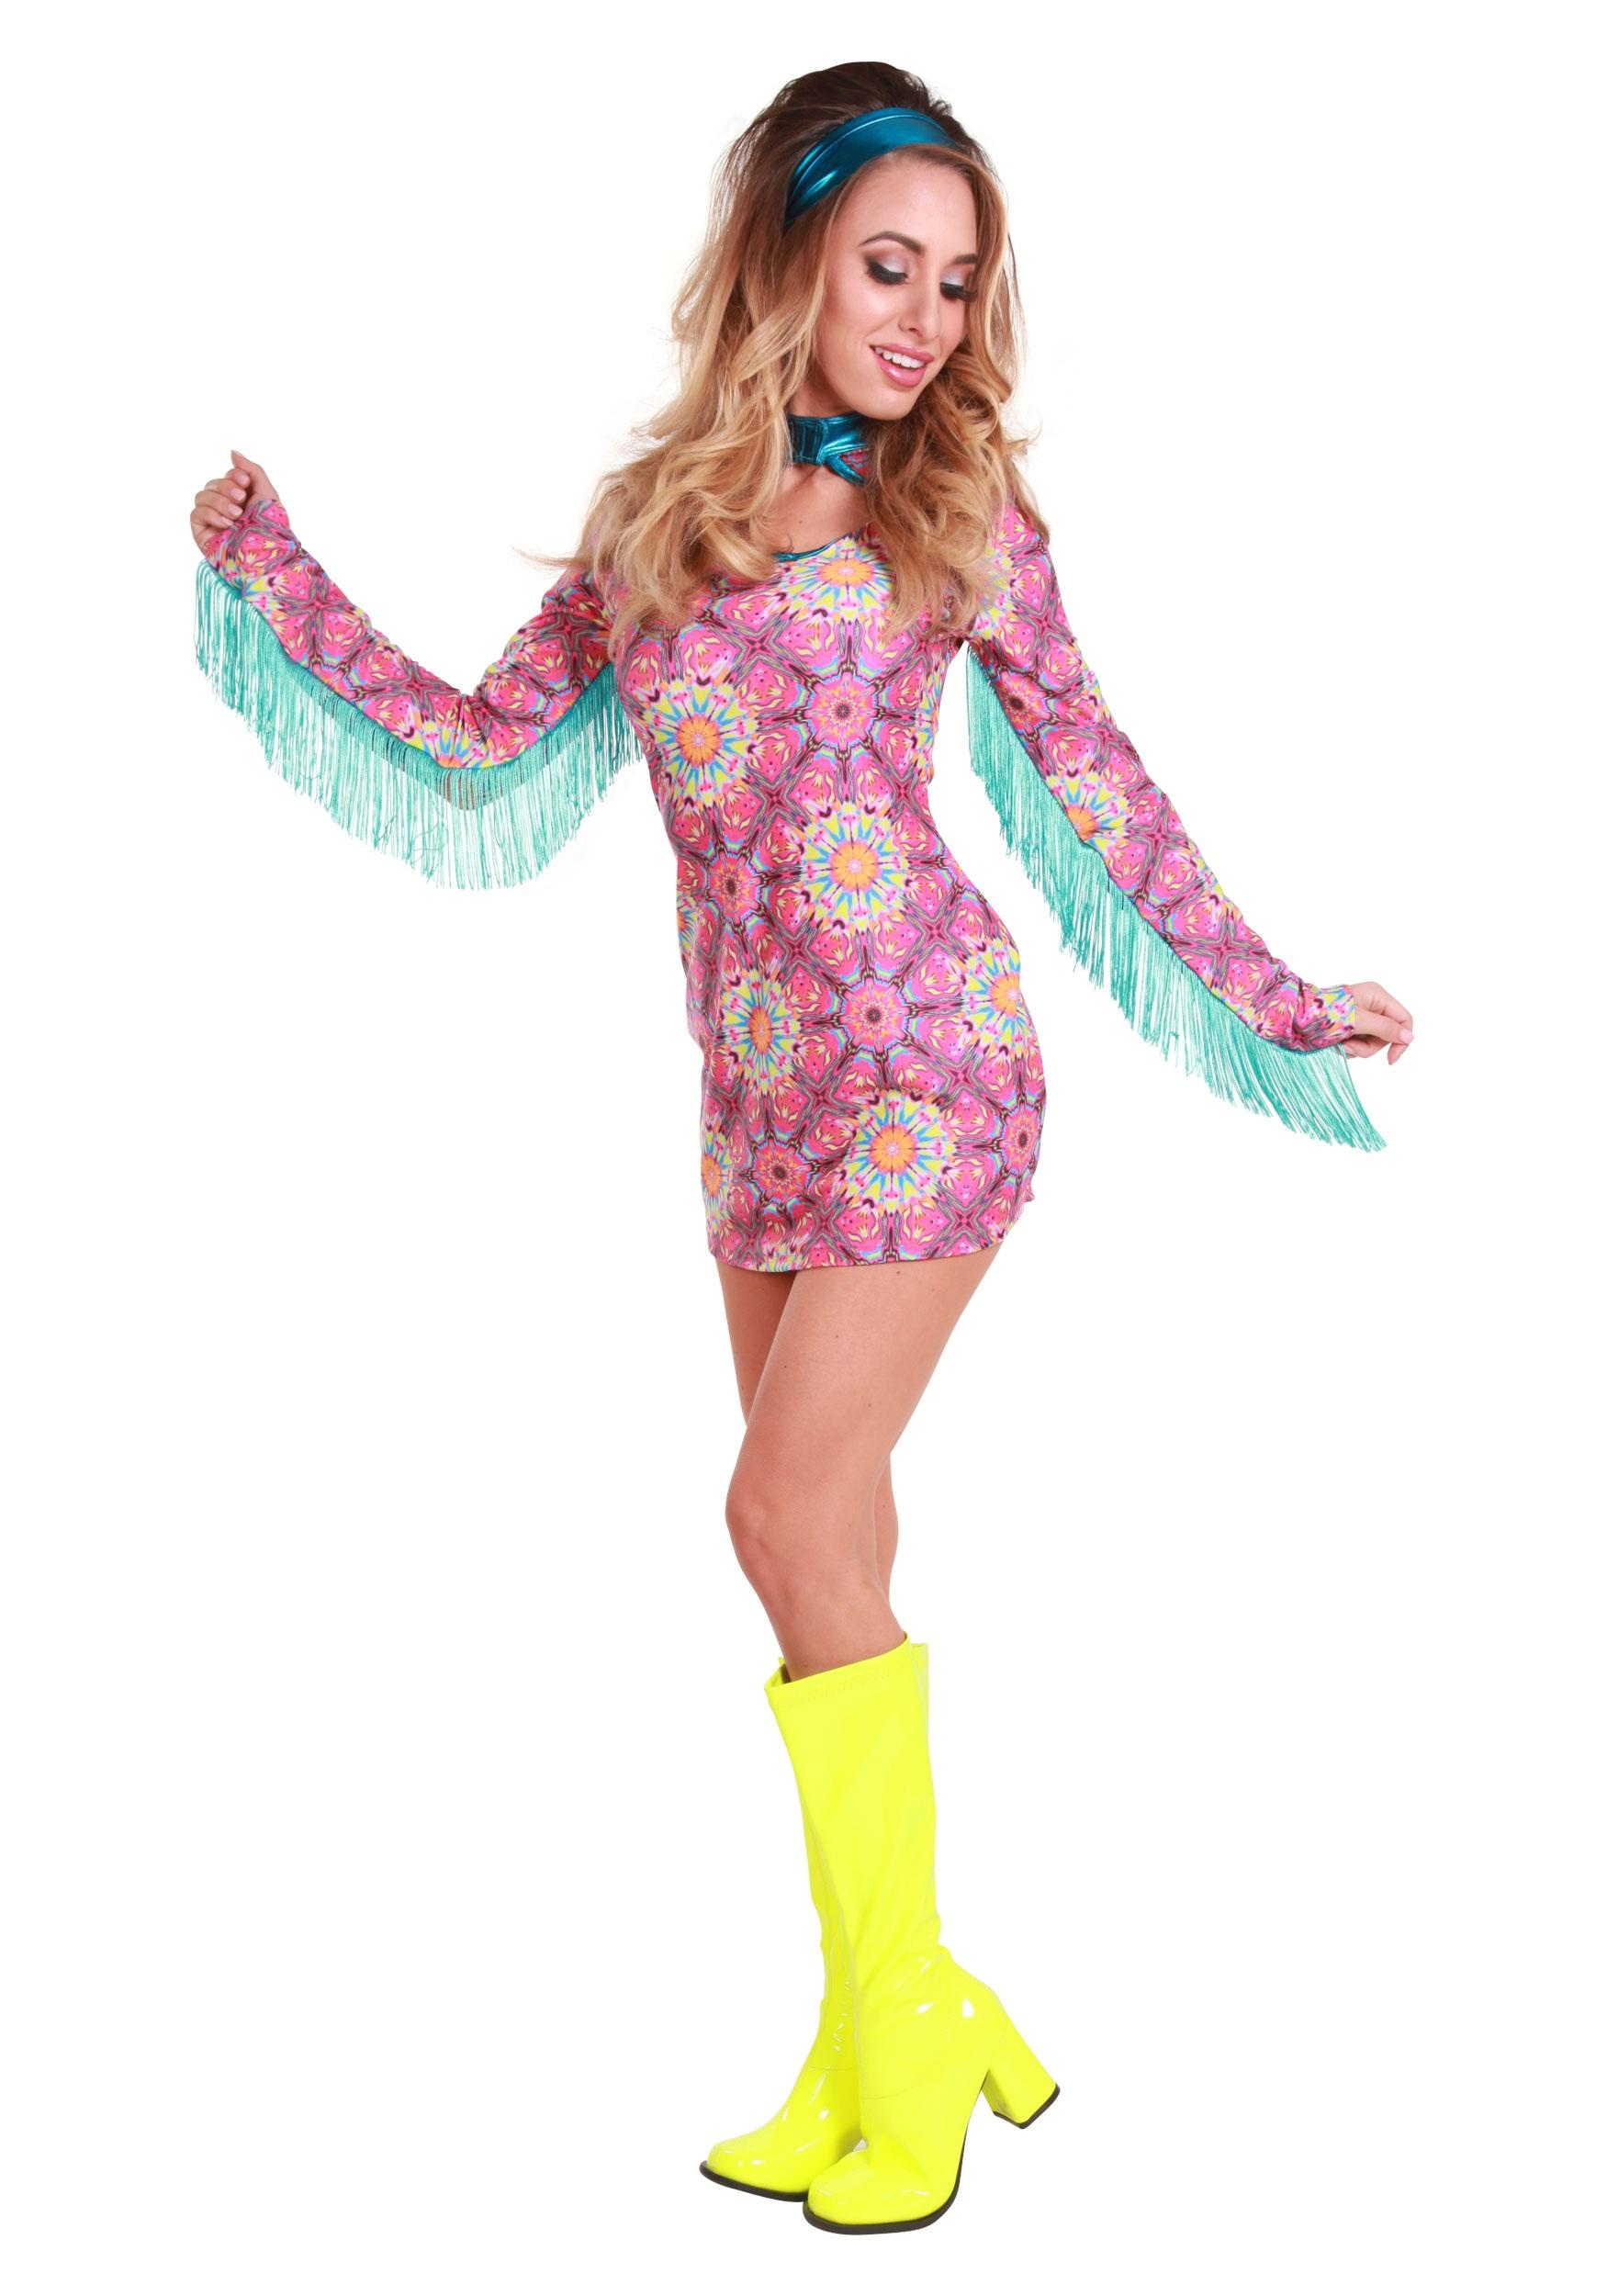 Brilliant Girls Retro Hippie Girl Fancy Dress Up Party Costume Halloween Child